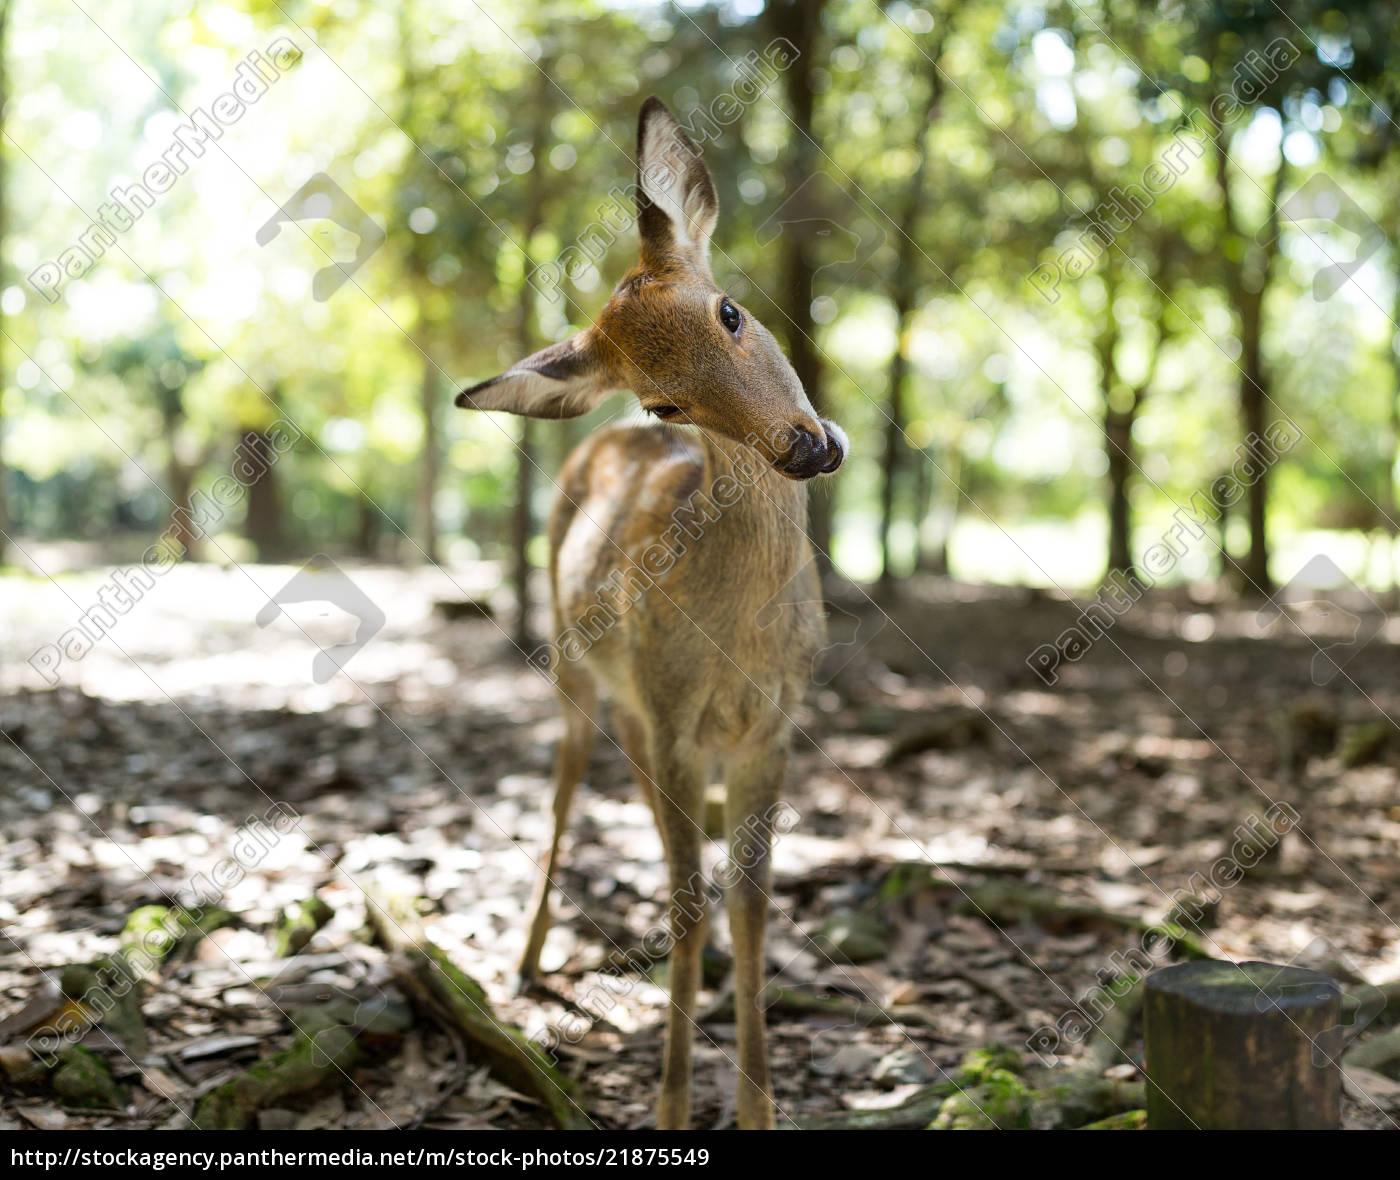 Cute Deer In A Park Stock Photo 21875549 Panthermedia Stock Agency